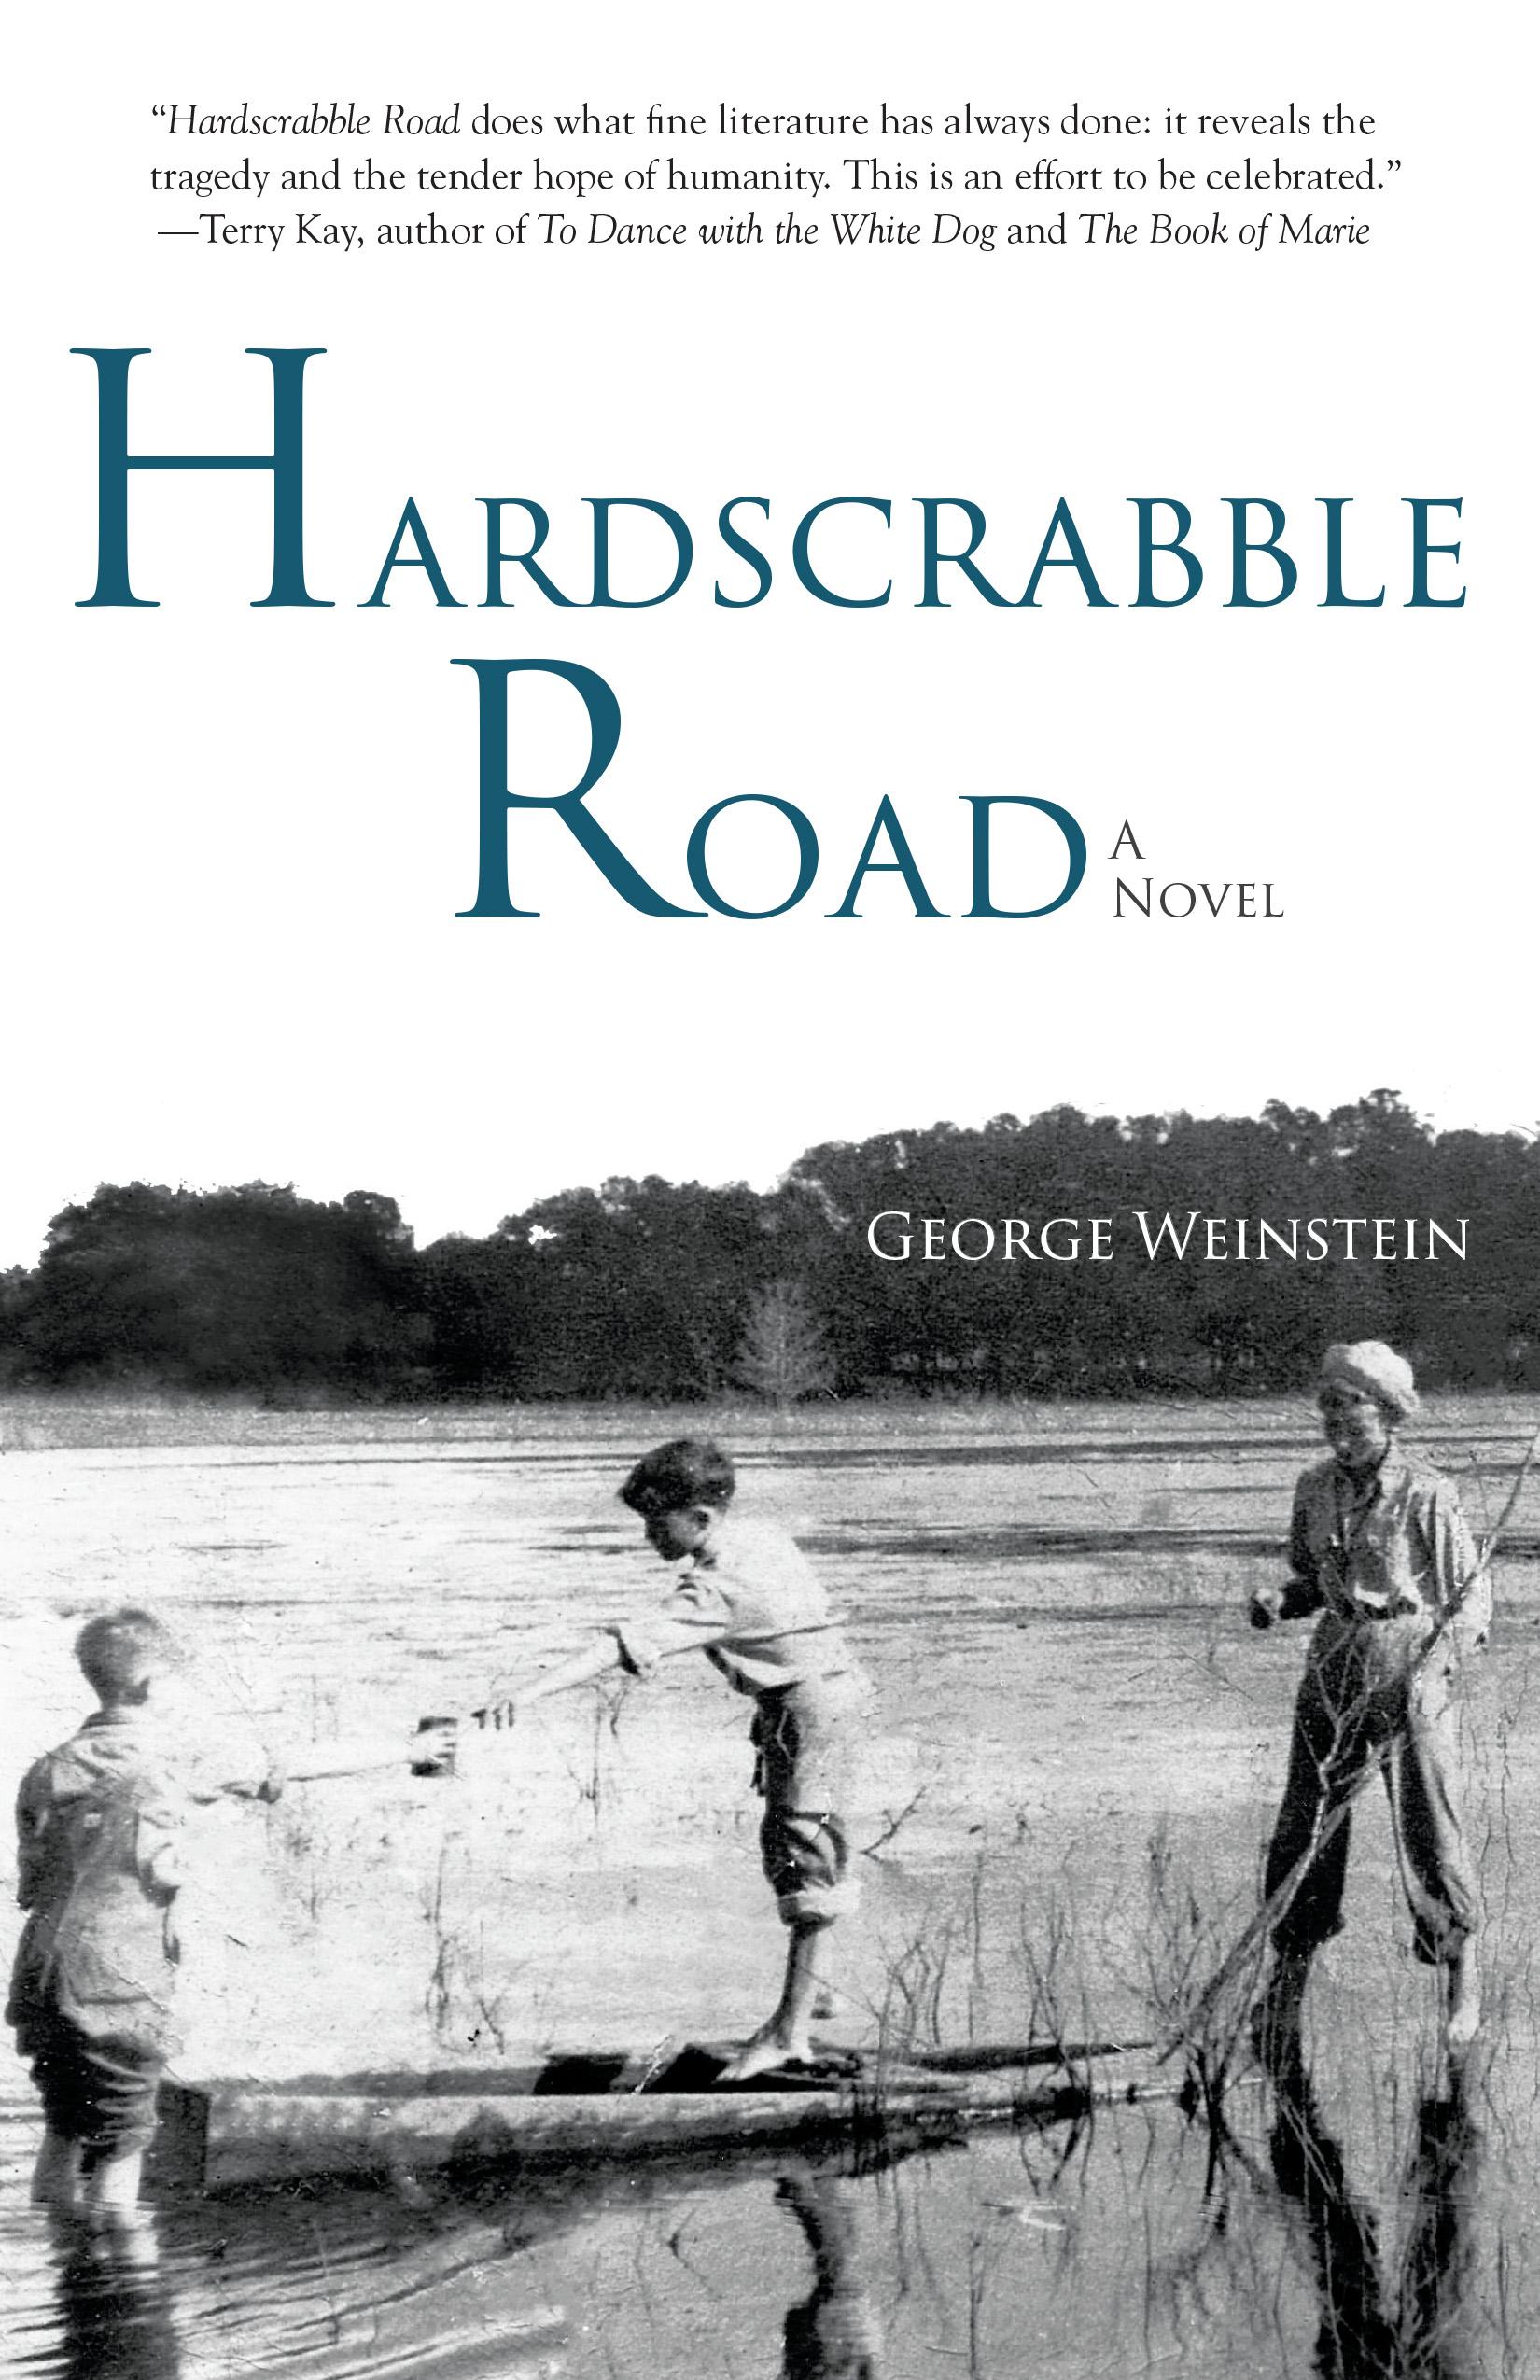 Hardscrabble Road by George Weinstein (SFK Press, 2018)